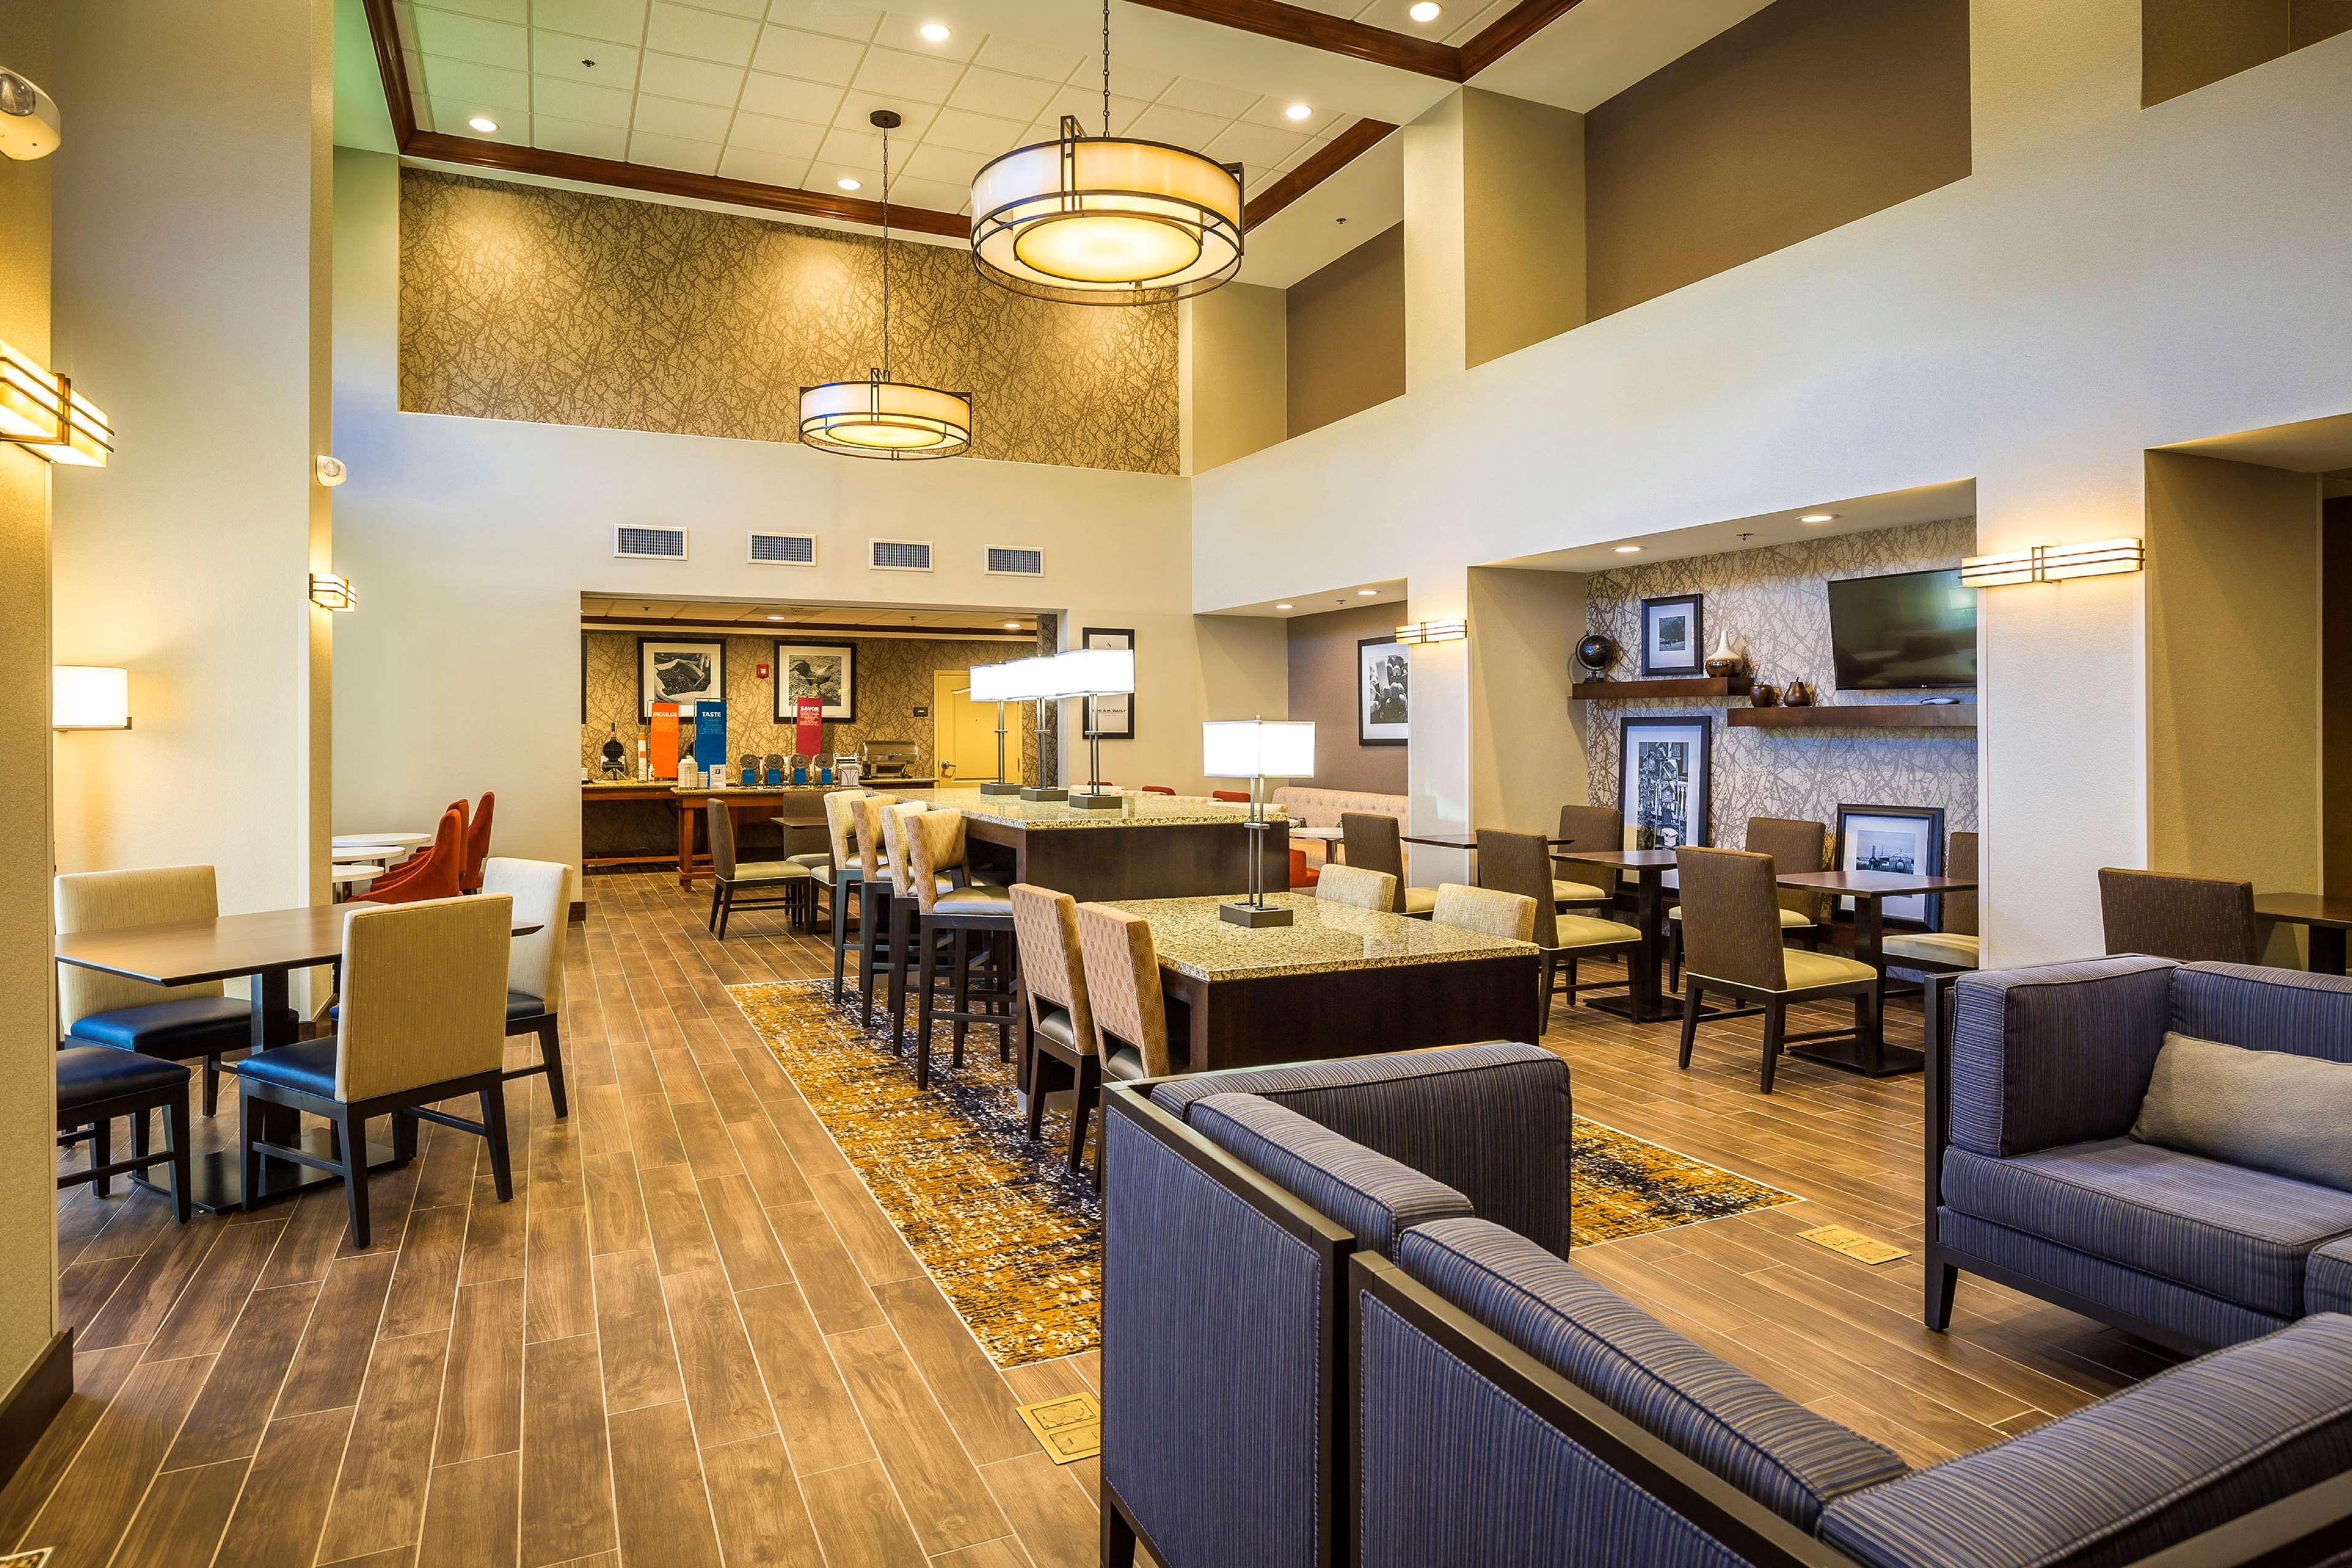 Hampton Inn & Suites Windsor - Sonoma Wine Country image 4